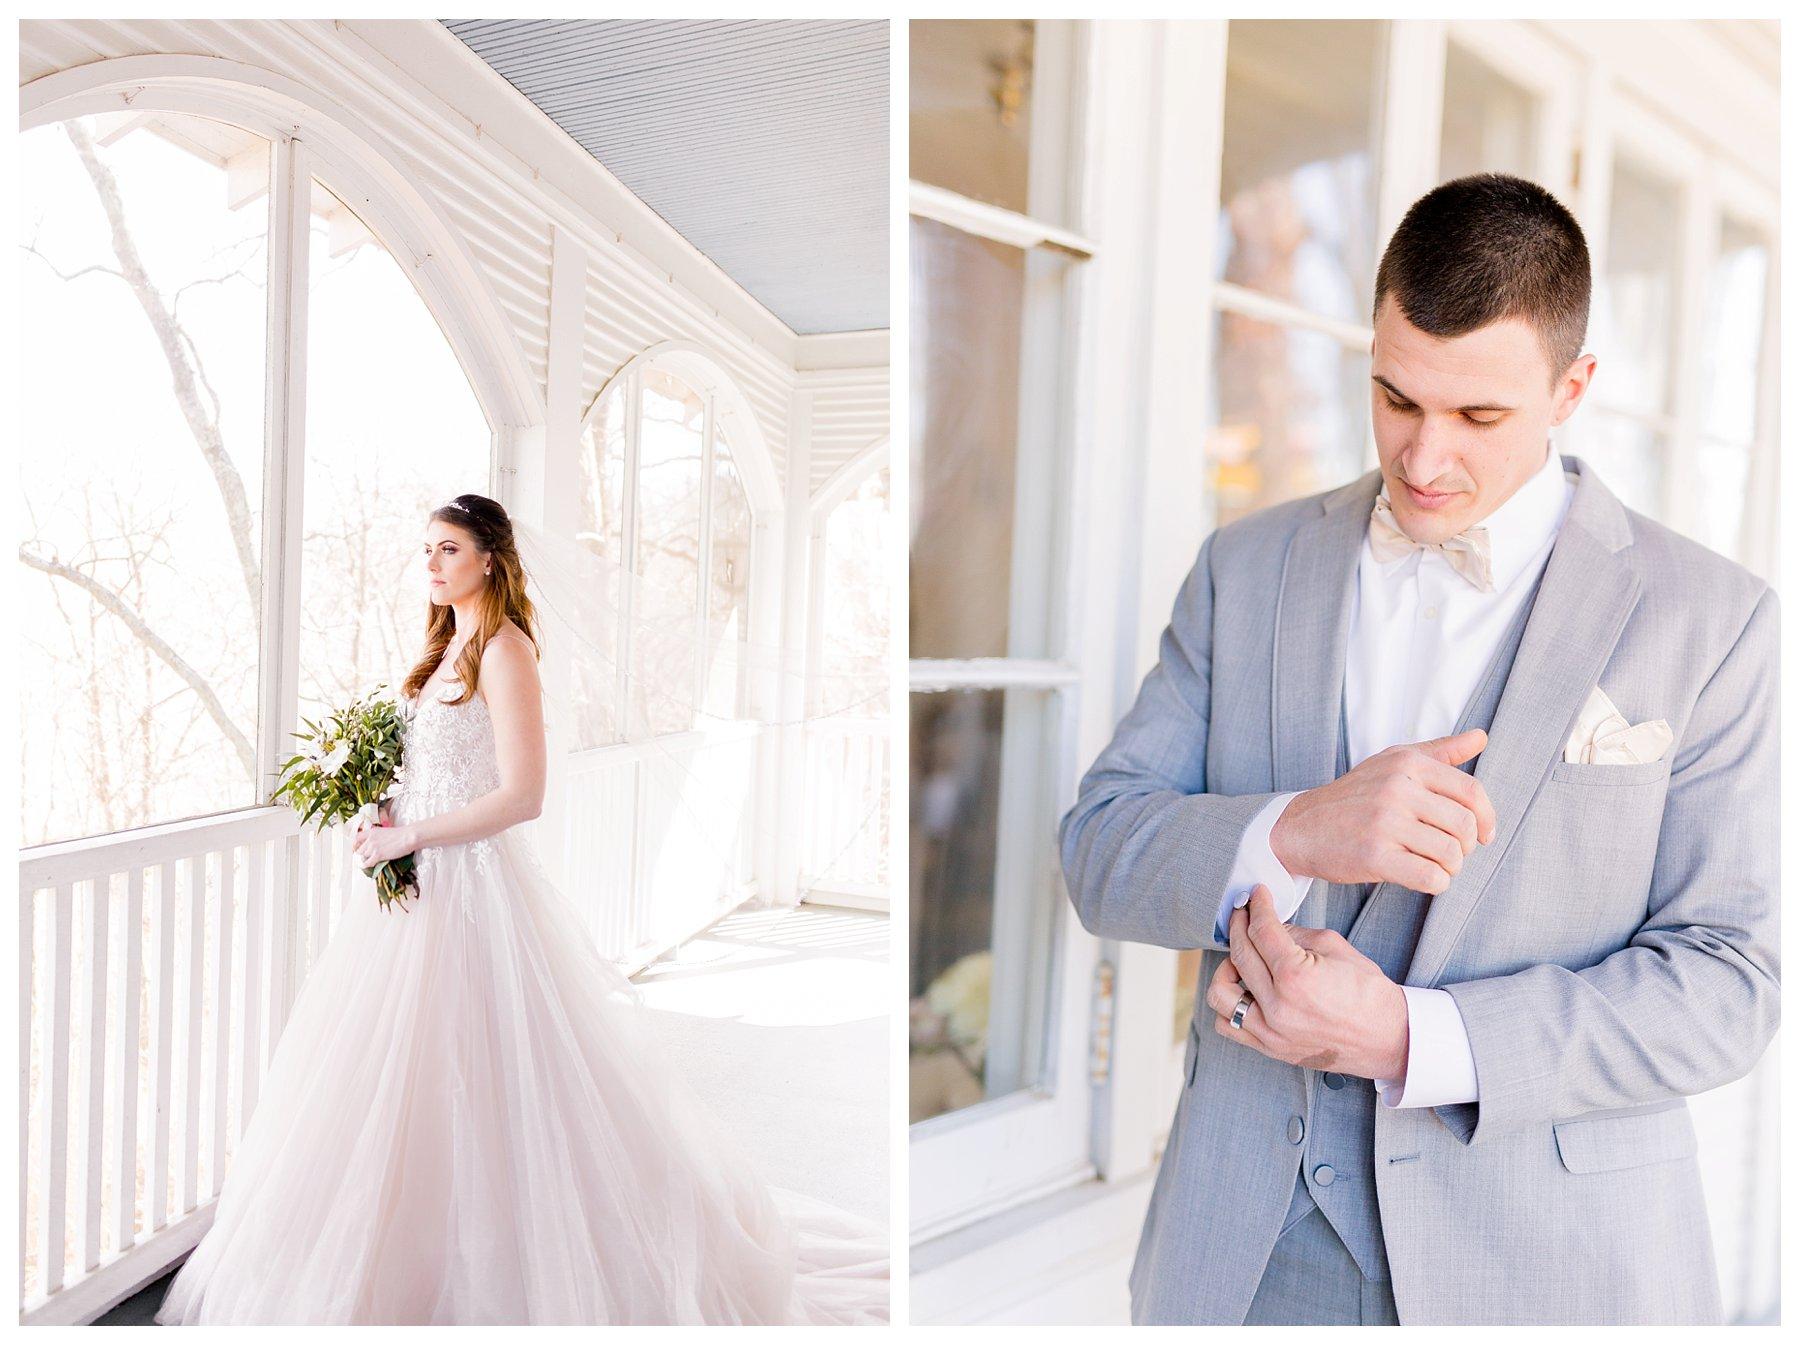 photographer_wedding_saint_louis_Kansas_City_Photography_Videography_workshop_training_styled_engagement_Lake_Ozark_KC_MO_STL_Rolla_Hermann_Saint_James_0389.jpg